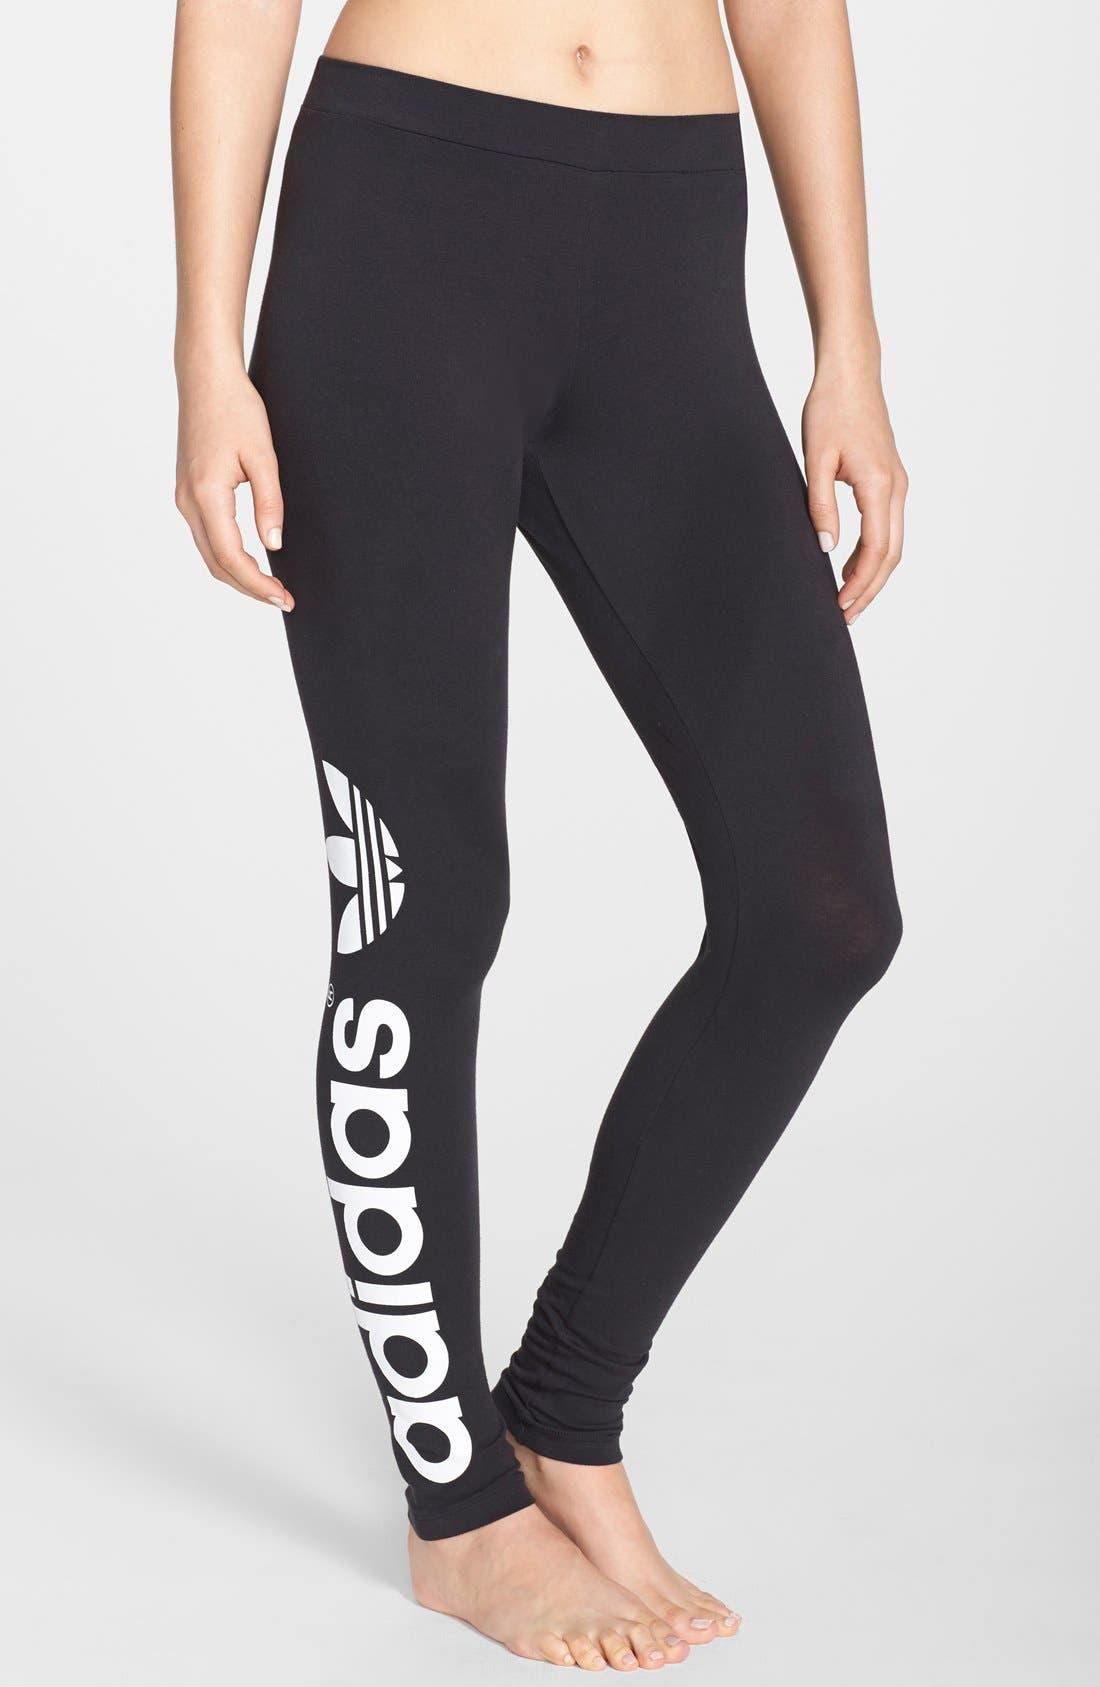 Alternate Image 1 Selected - adidas Originals Trefoil Leggings (Online Only)